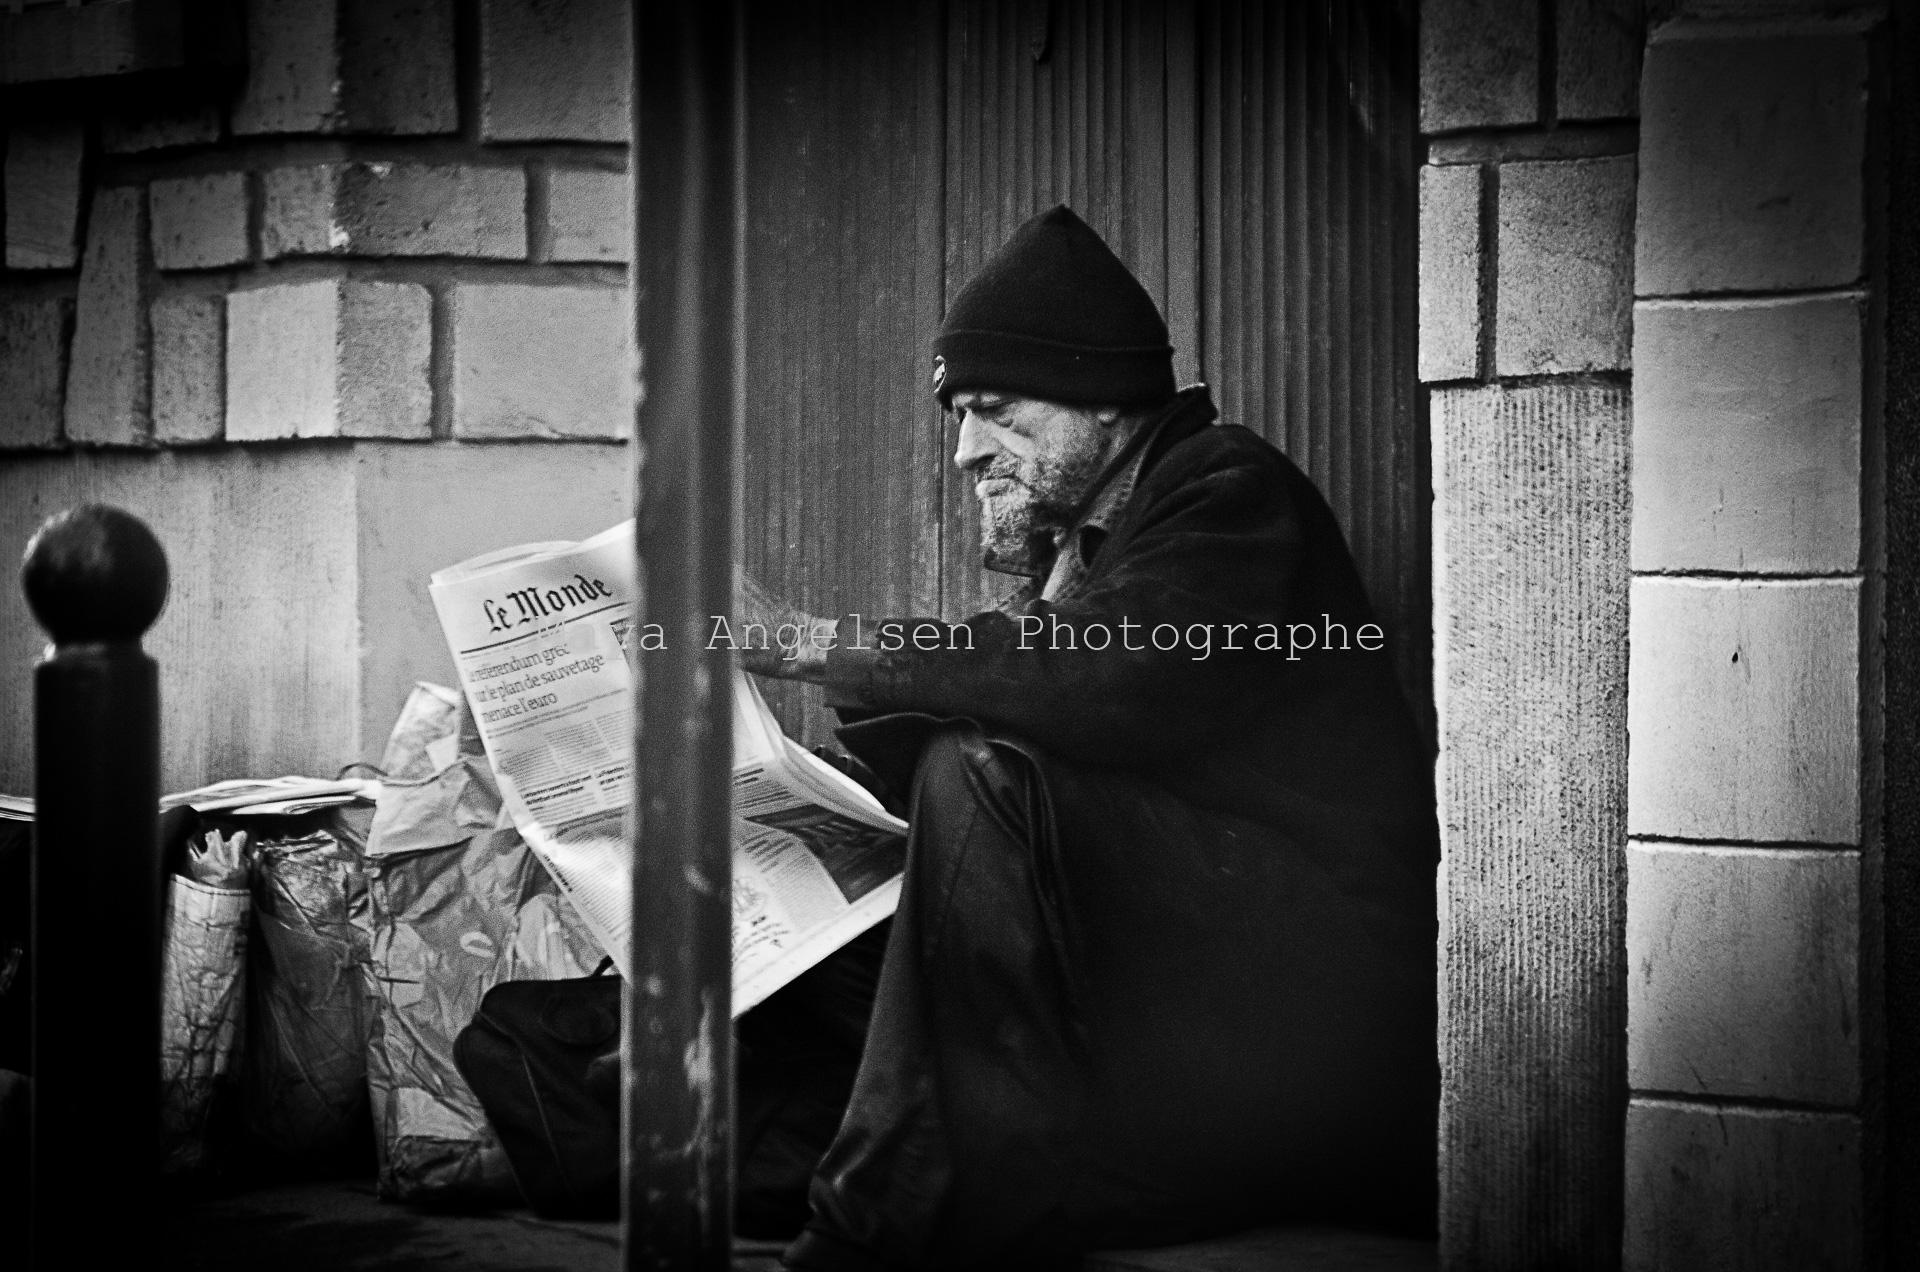 Photographe-streetphoto-maya-angelsen-le-monde